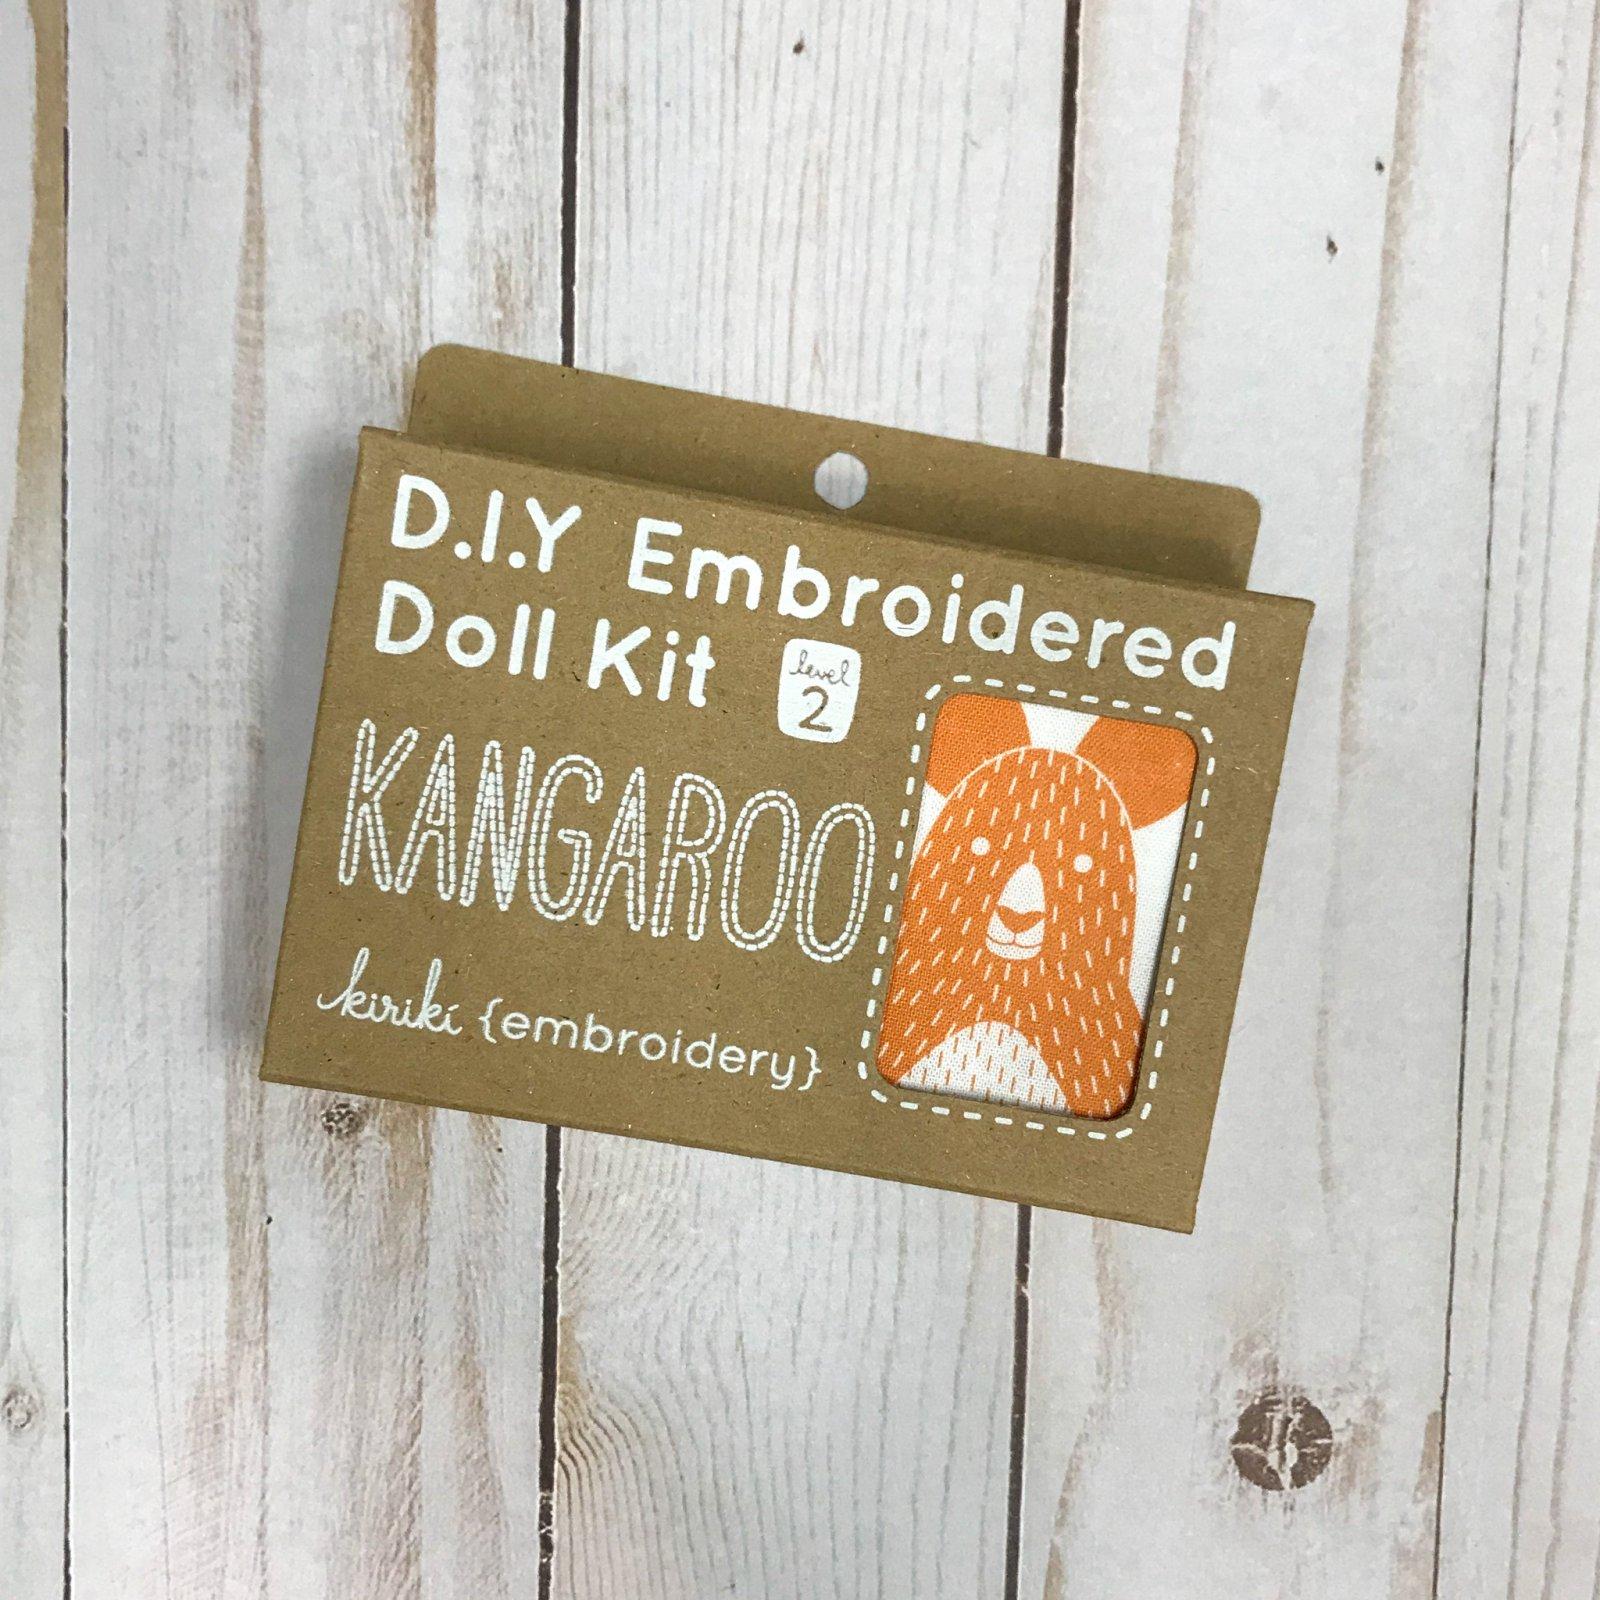 Embroidered Doll Kit - Level 2 - Kangaroo